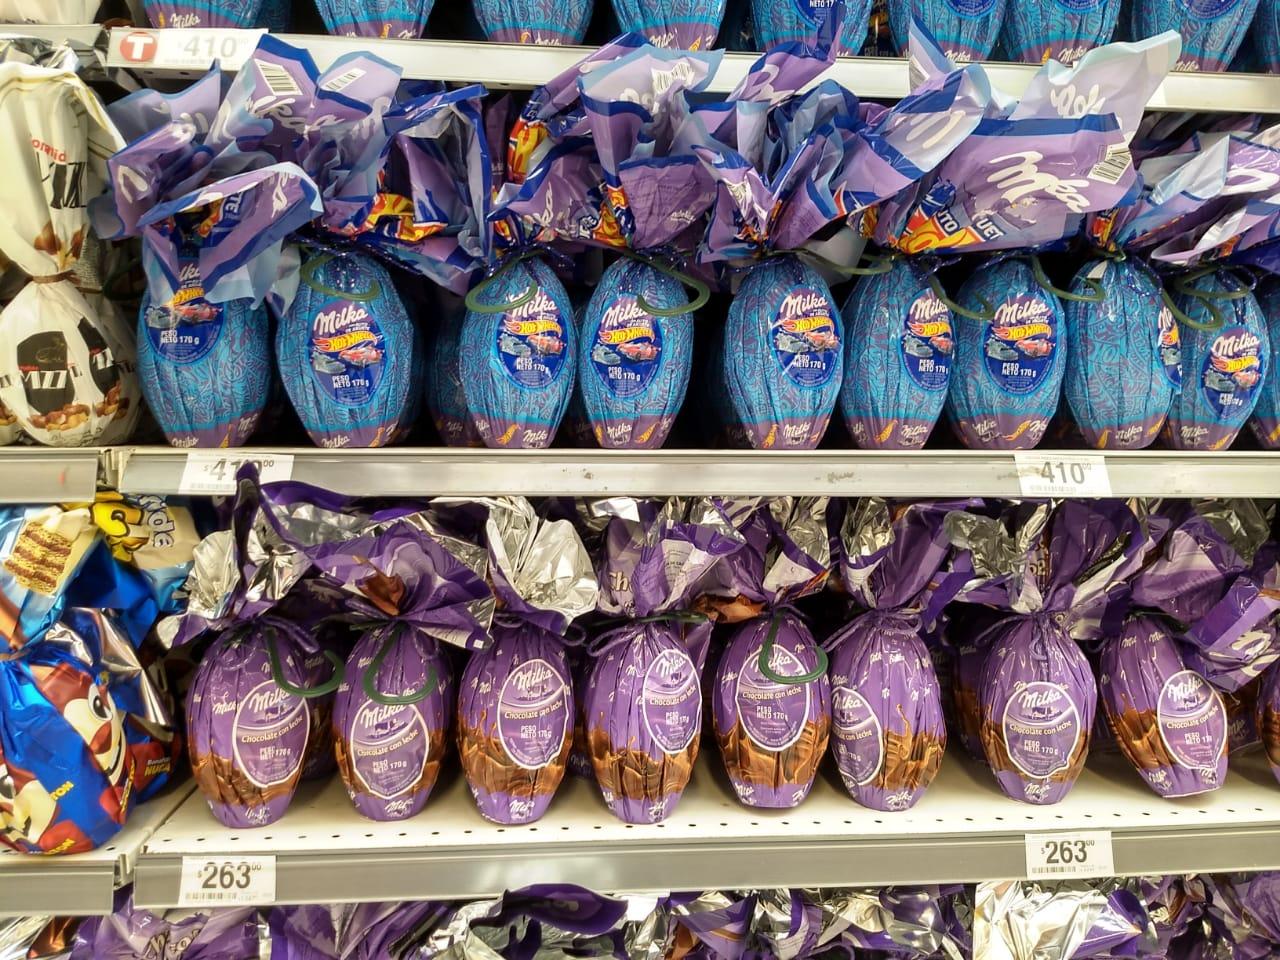 Resultado de imagen para huevos de pascuas supermercados